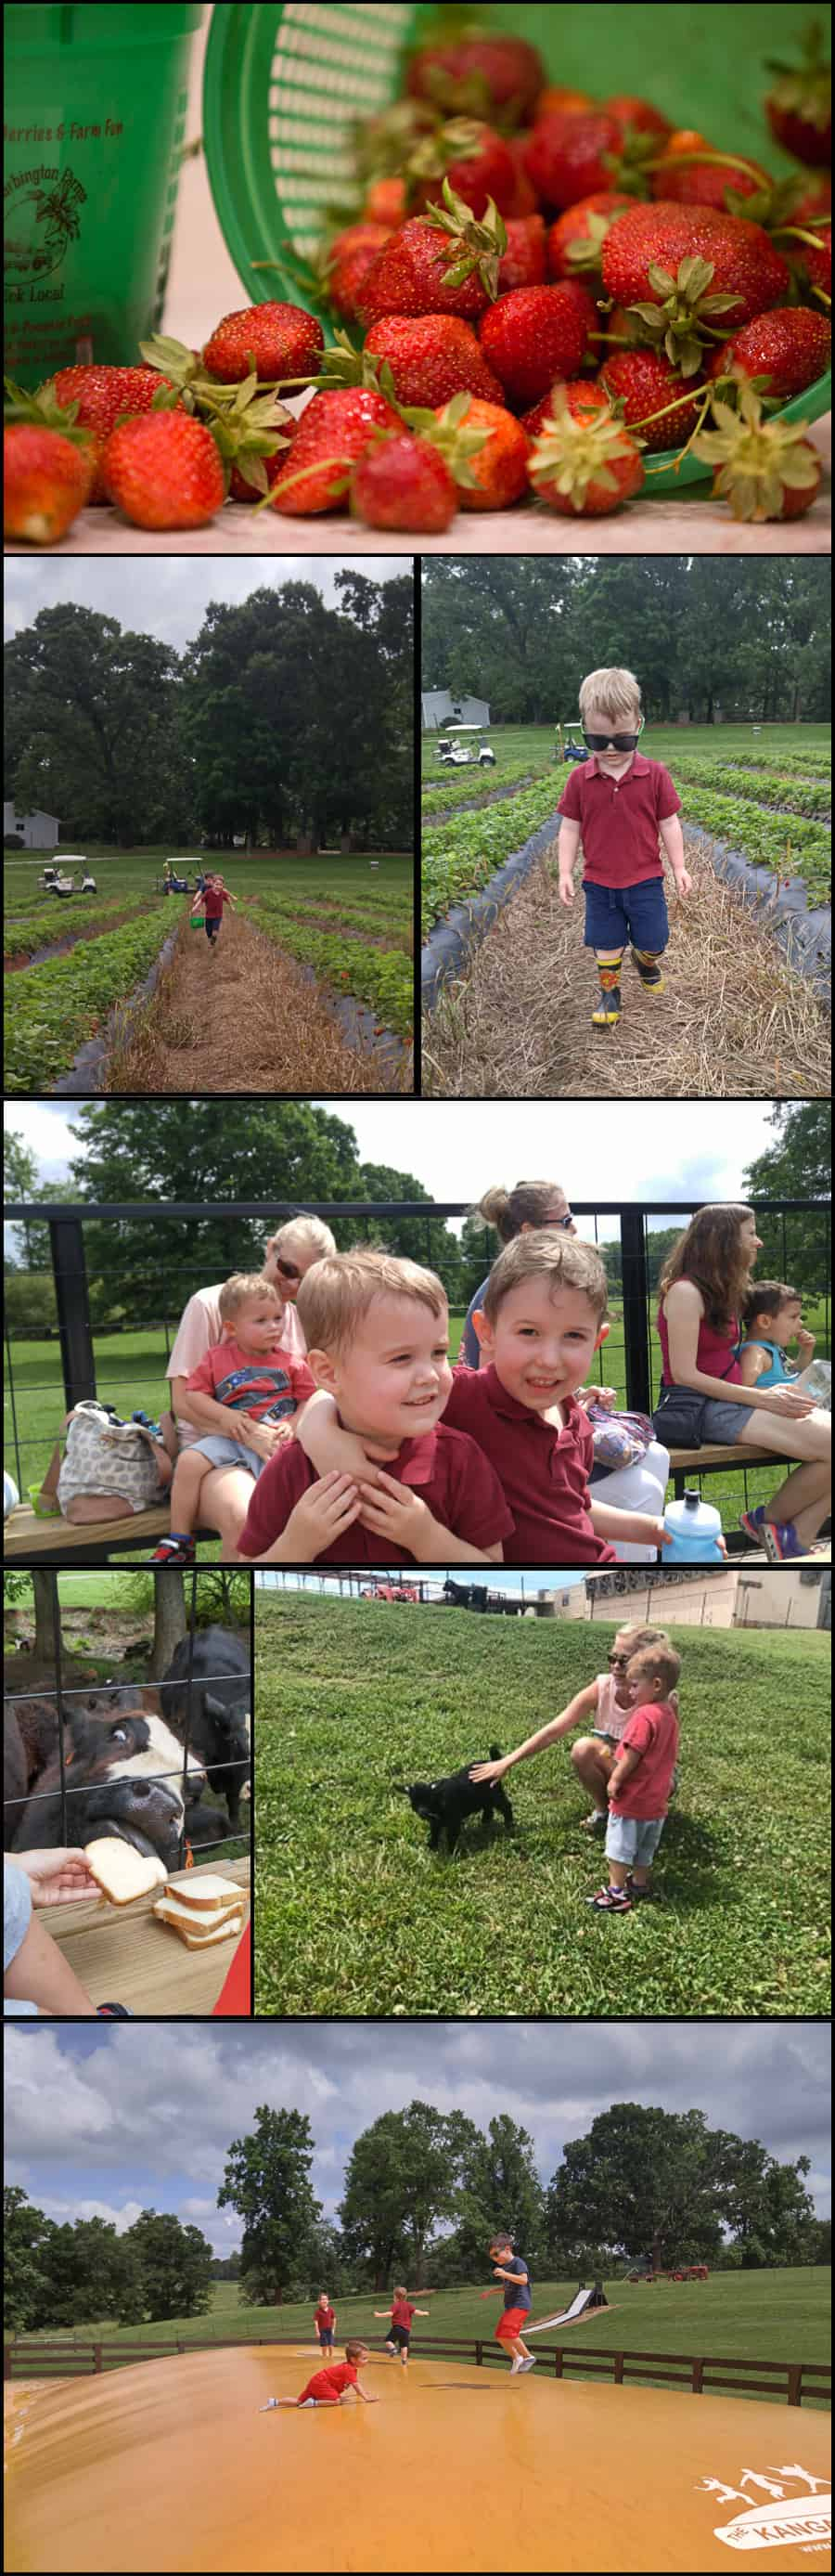 Strawberry Picking at Warbington Farms 2